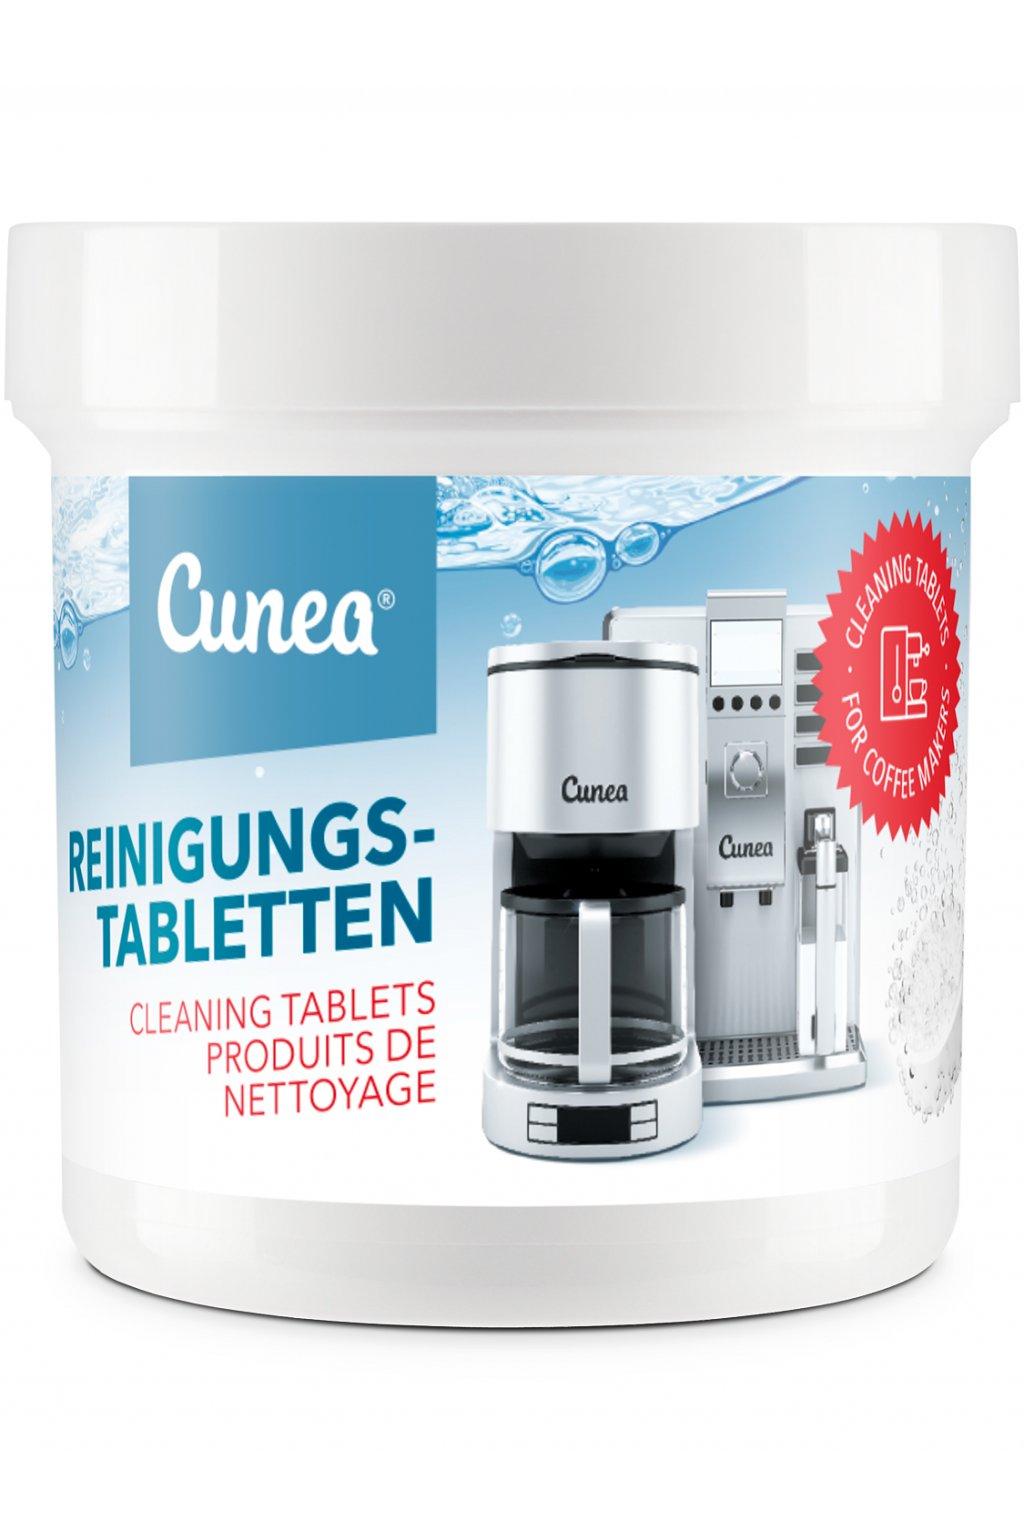 cistici tablety pro kavovary a espresso stroje Jura Miele Krups, Melitta Seaco Siemens Nivona Nespresso Philips Delonghi WMF Bosch